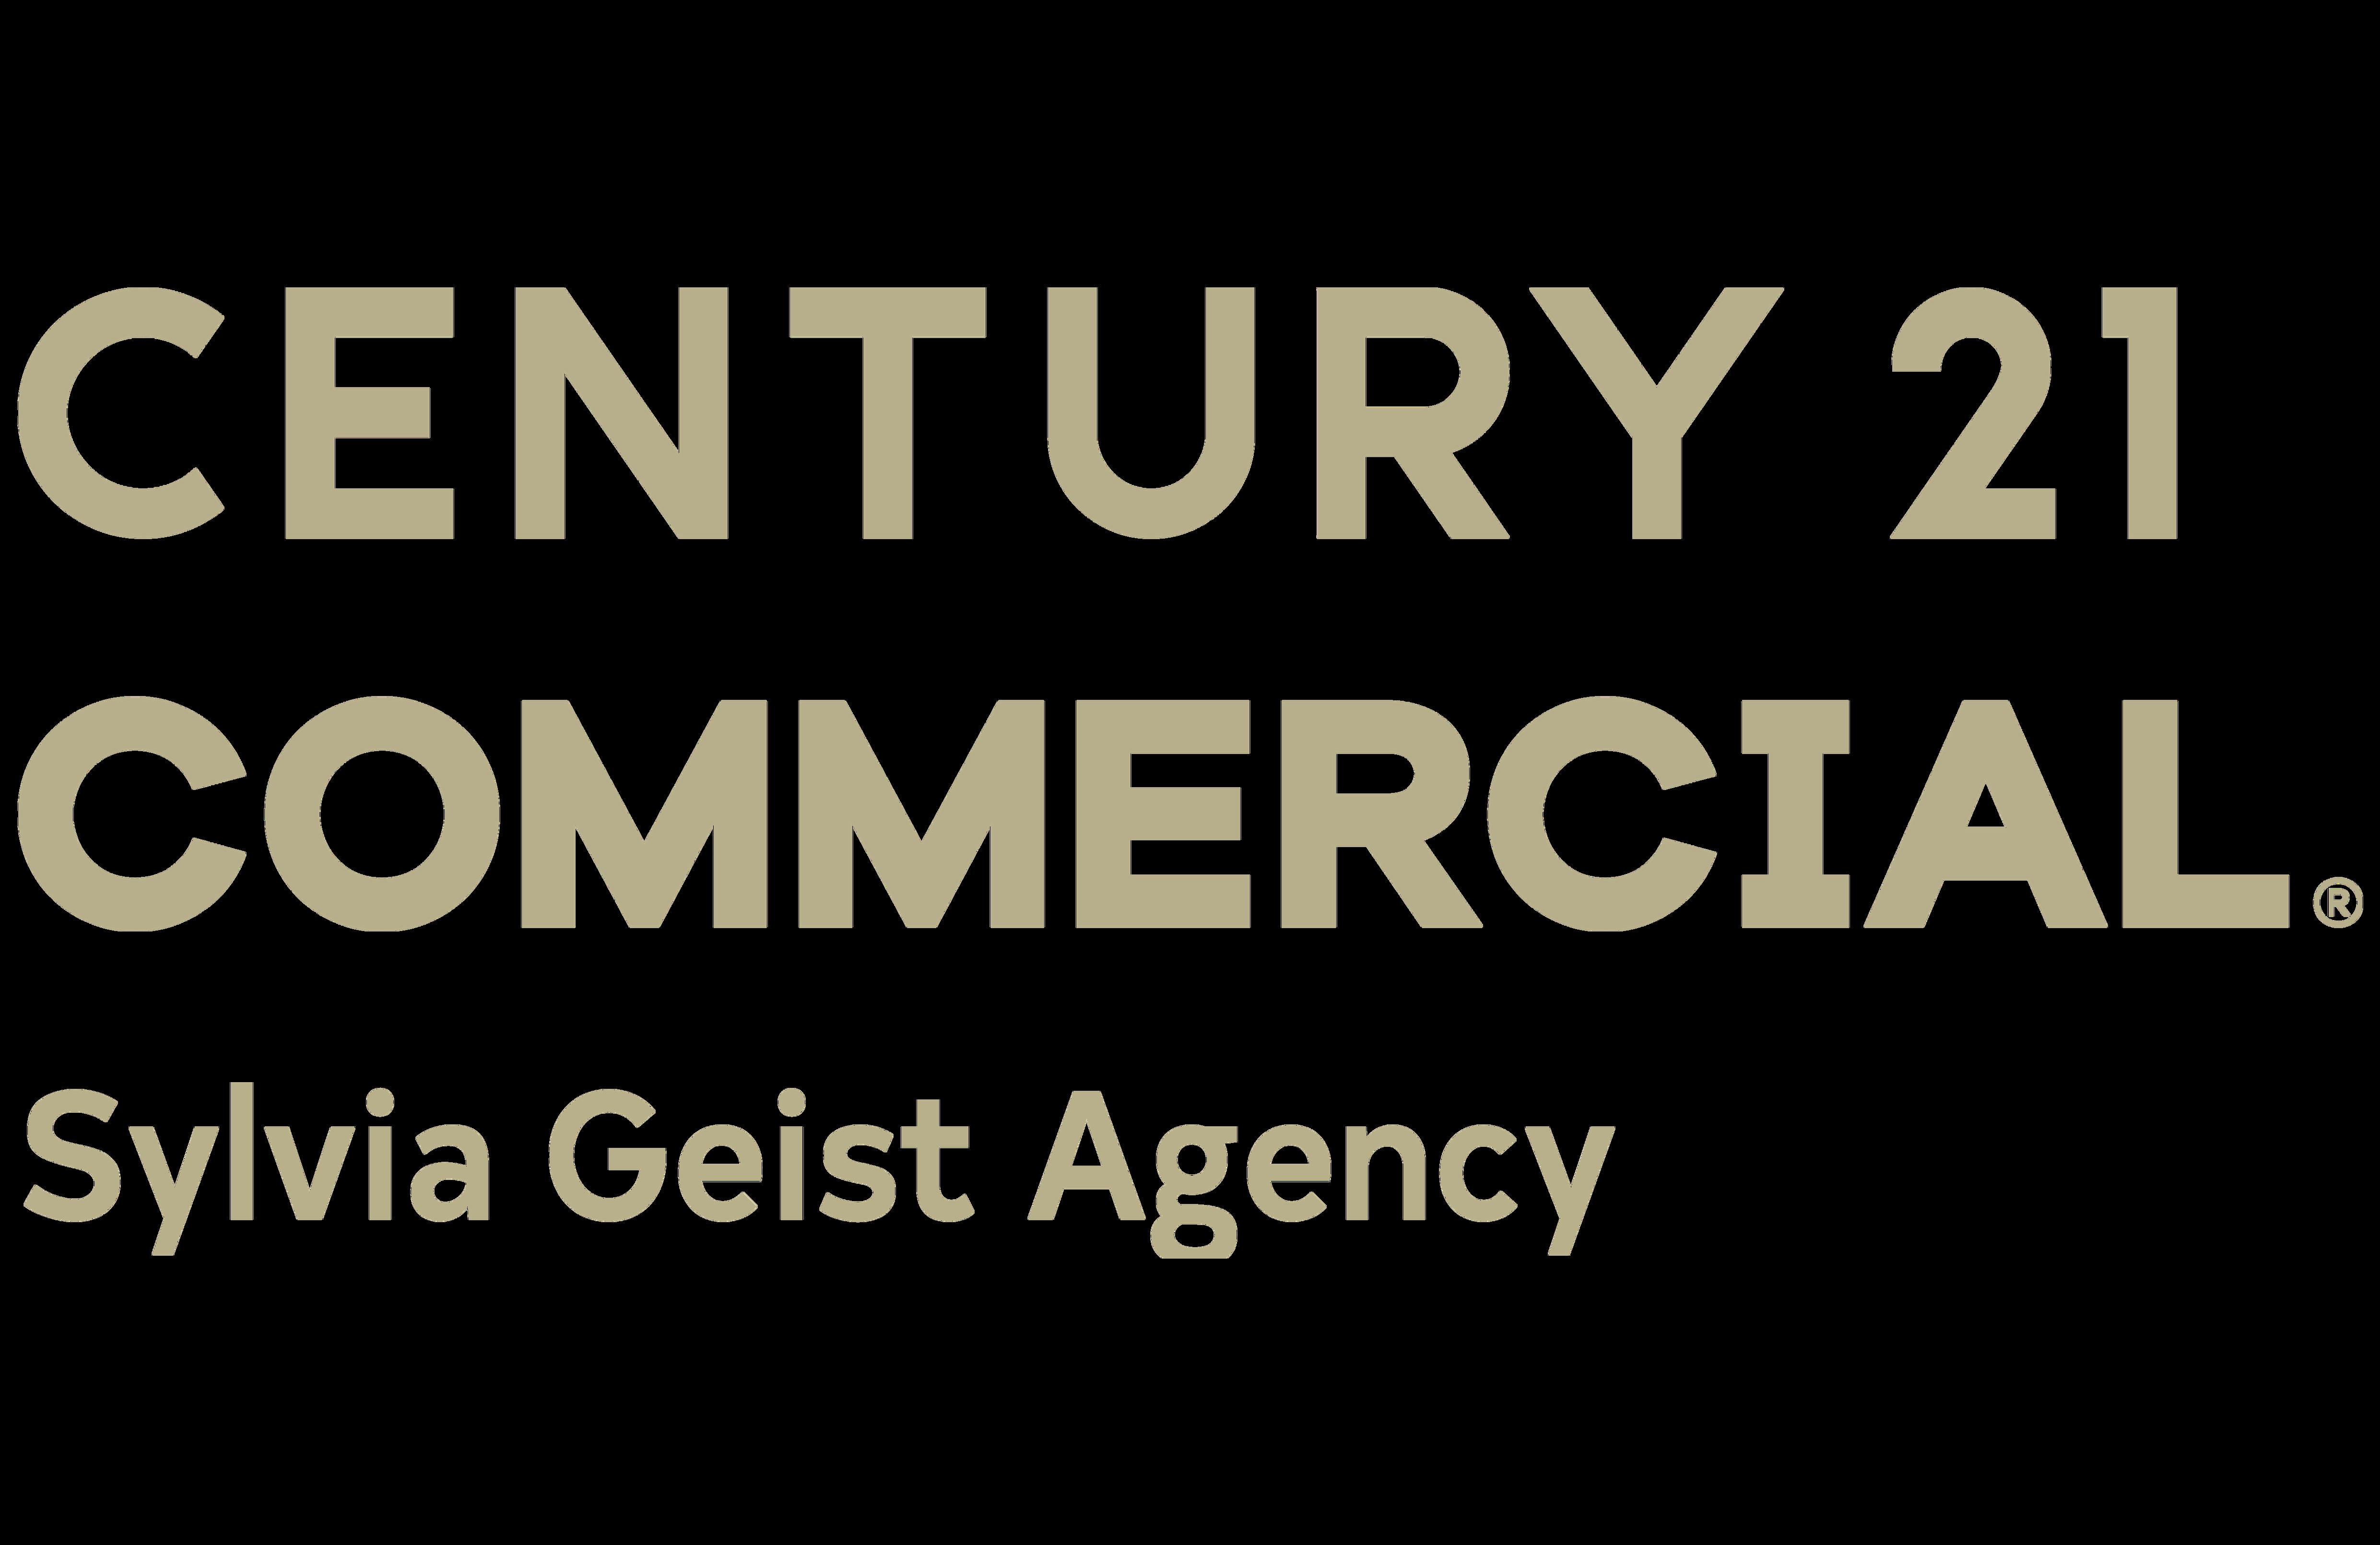 CENTURY 21 Sylvia Geist Agency